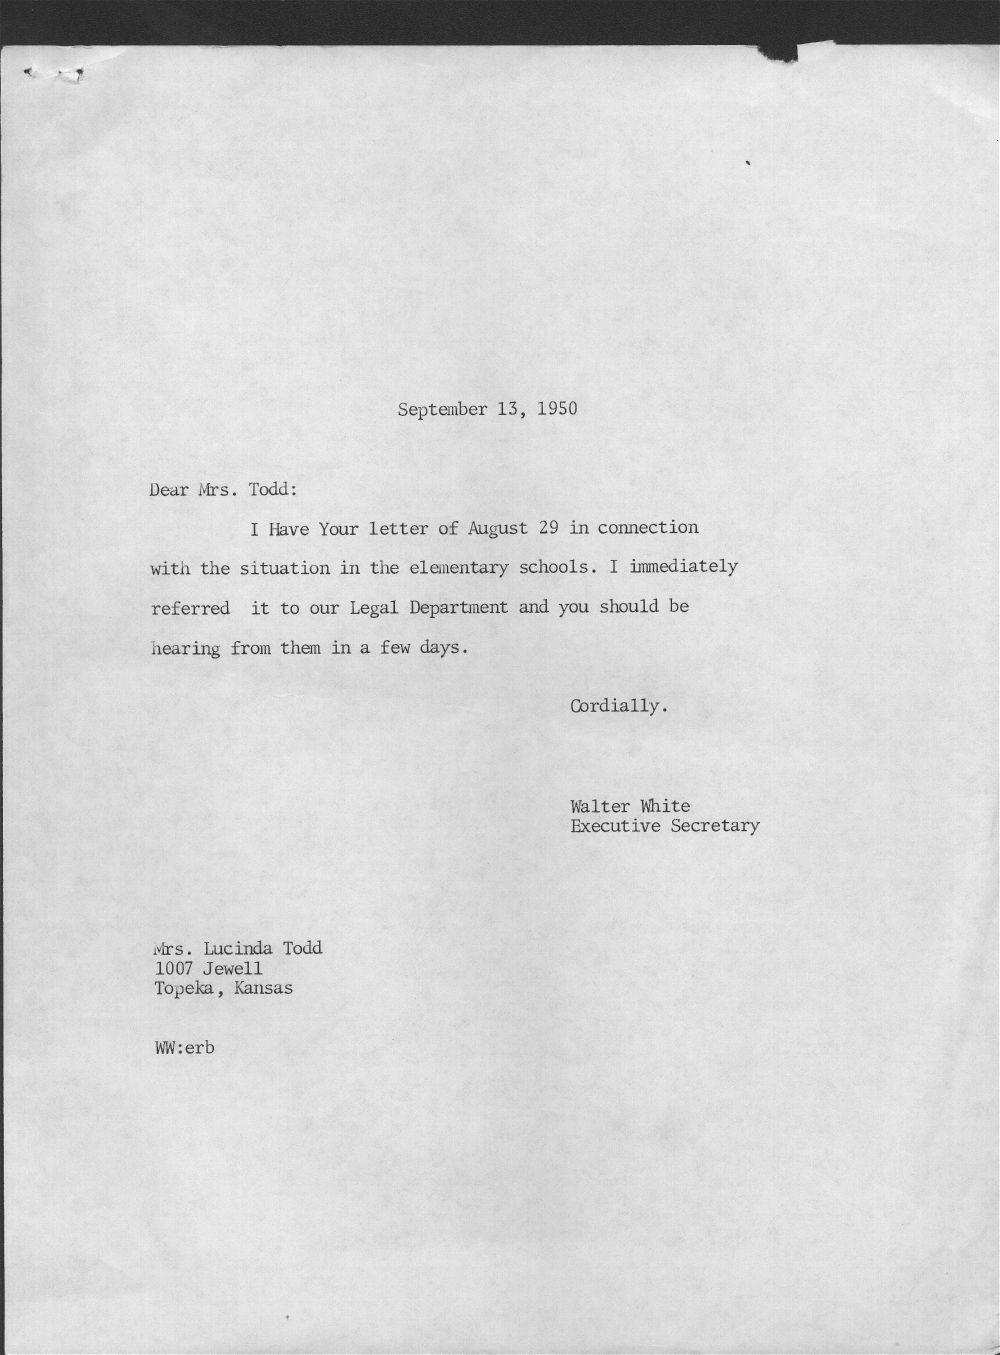 Walter White to Lucinda Todd